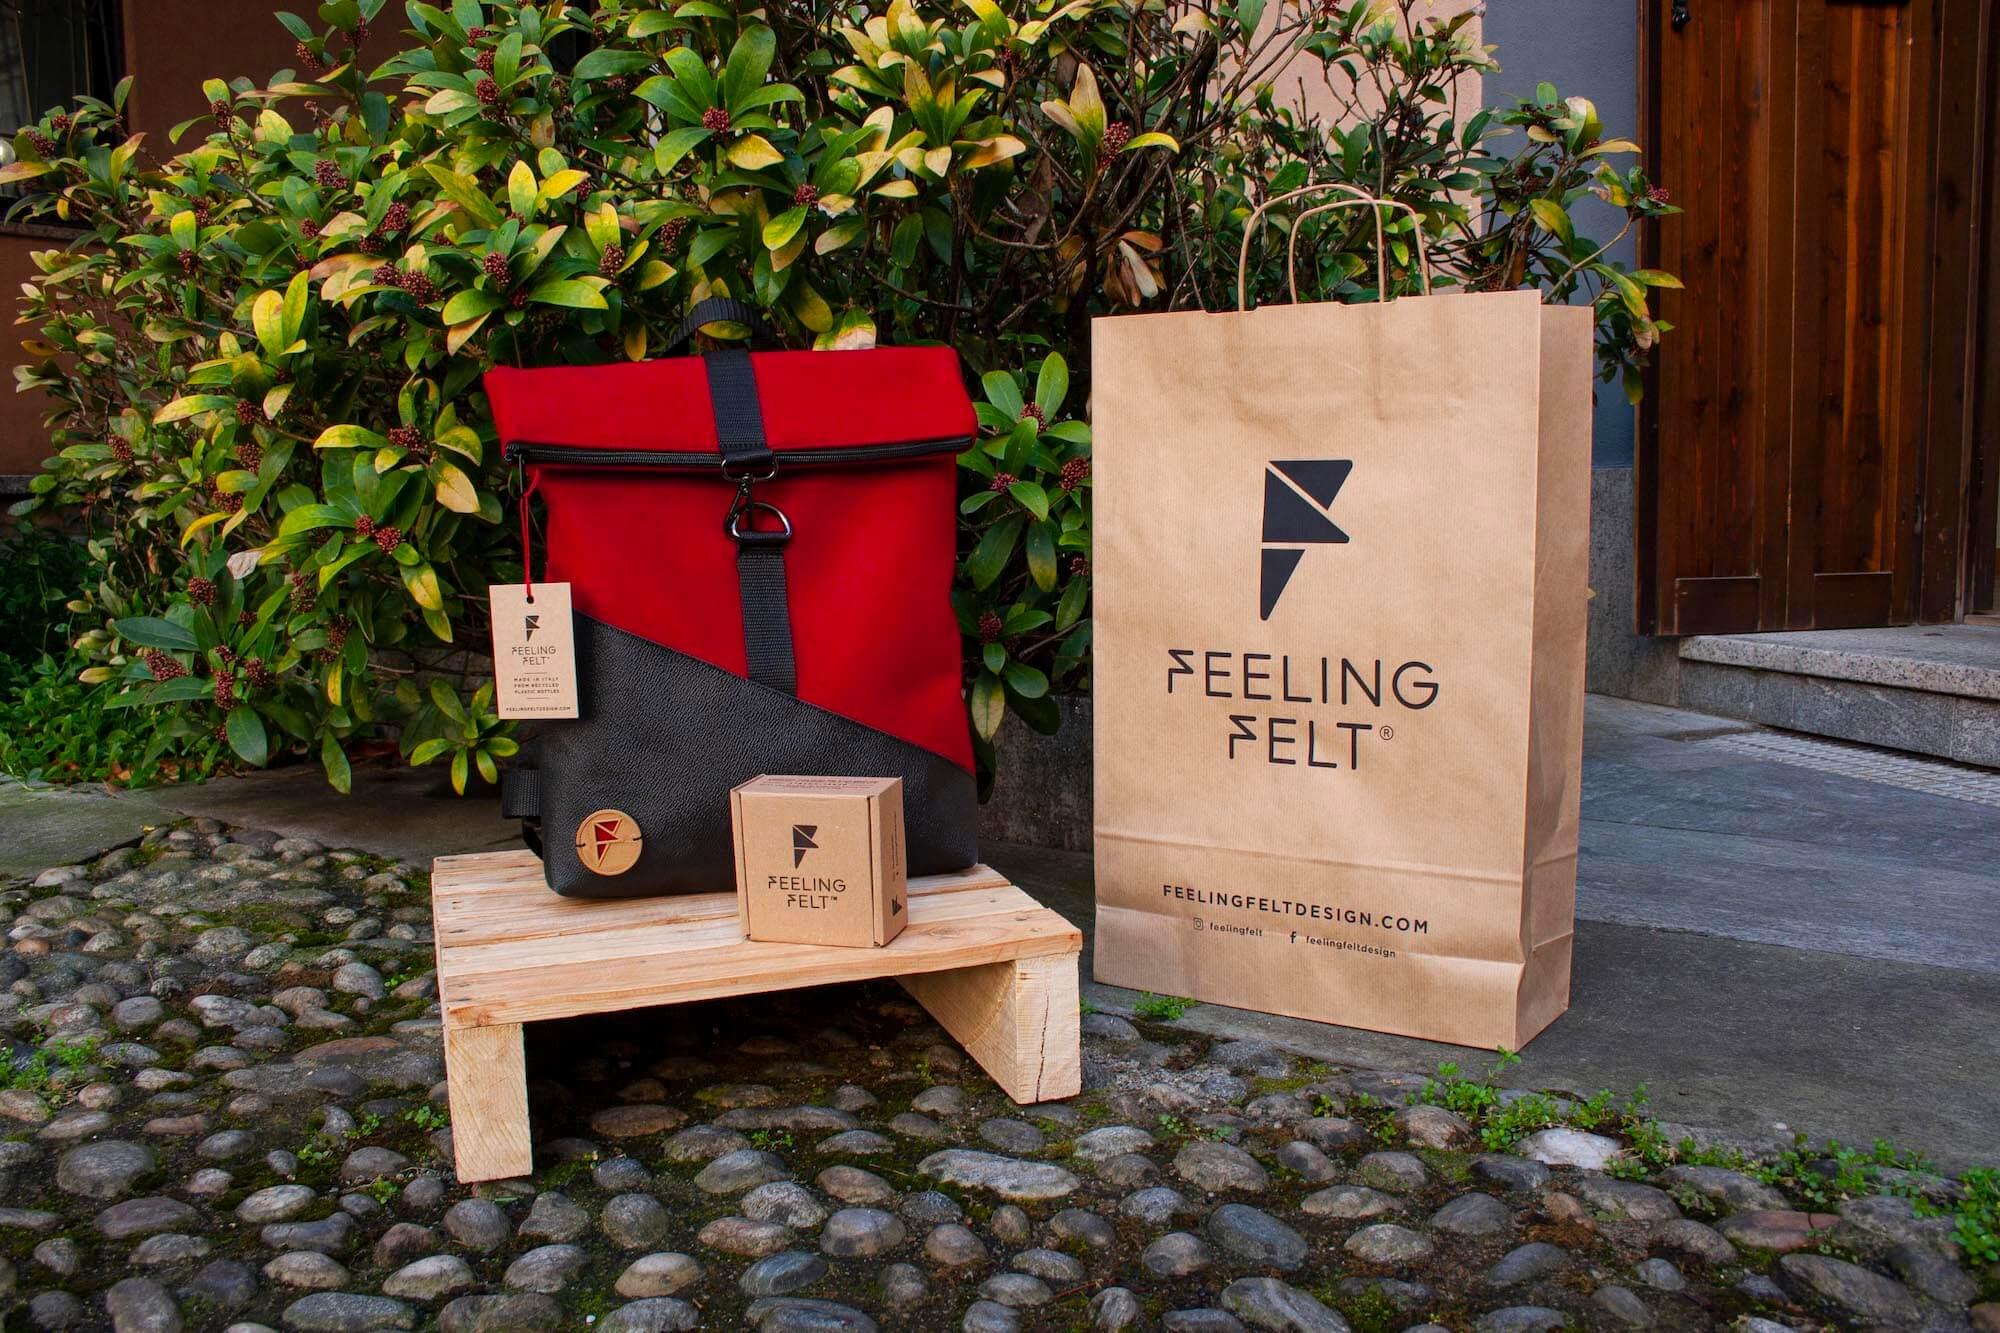 Sac à dos et sac en papier d'emballage Feeling Felt exposés dehors